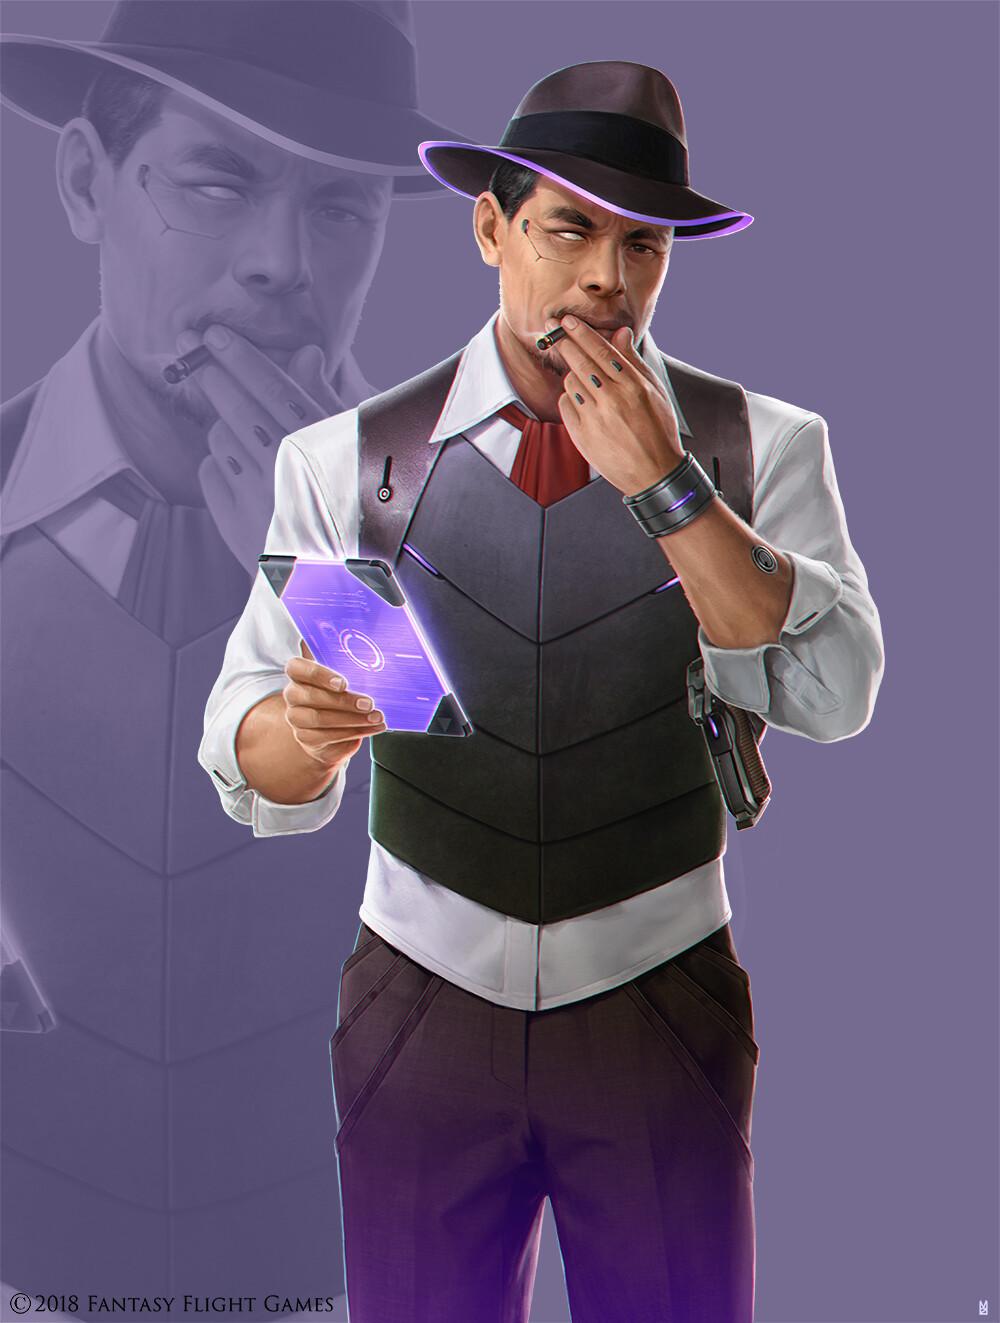 Matt zeilinger shadow investigator mattz